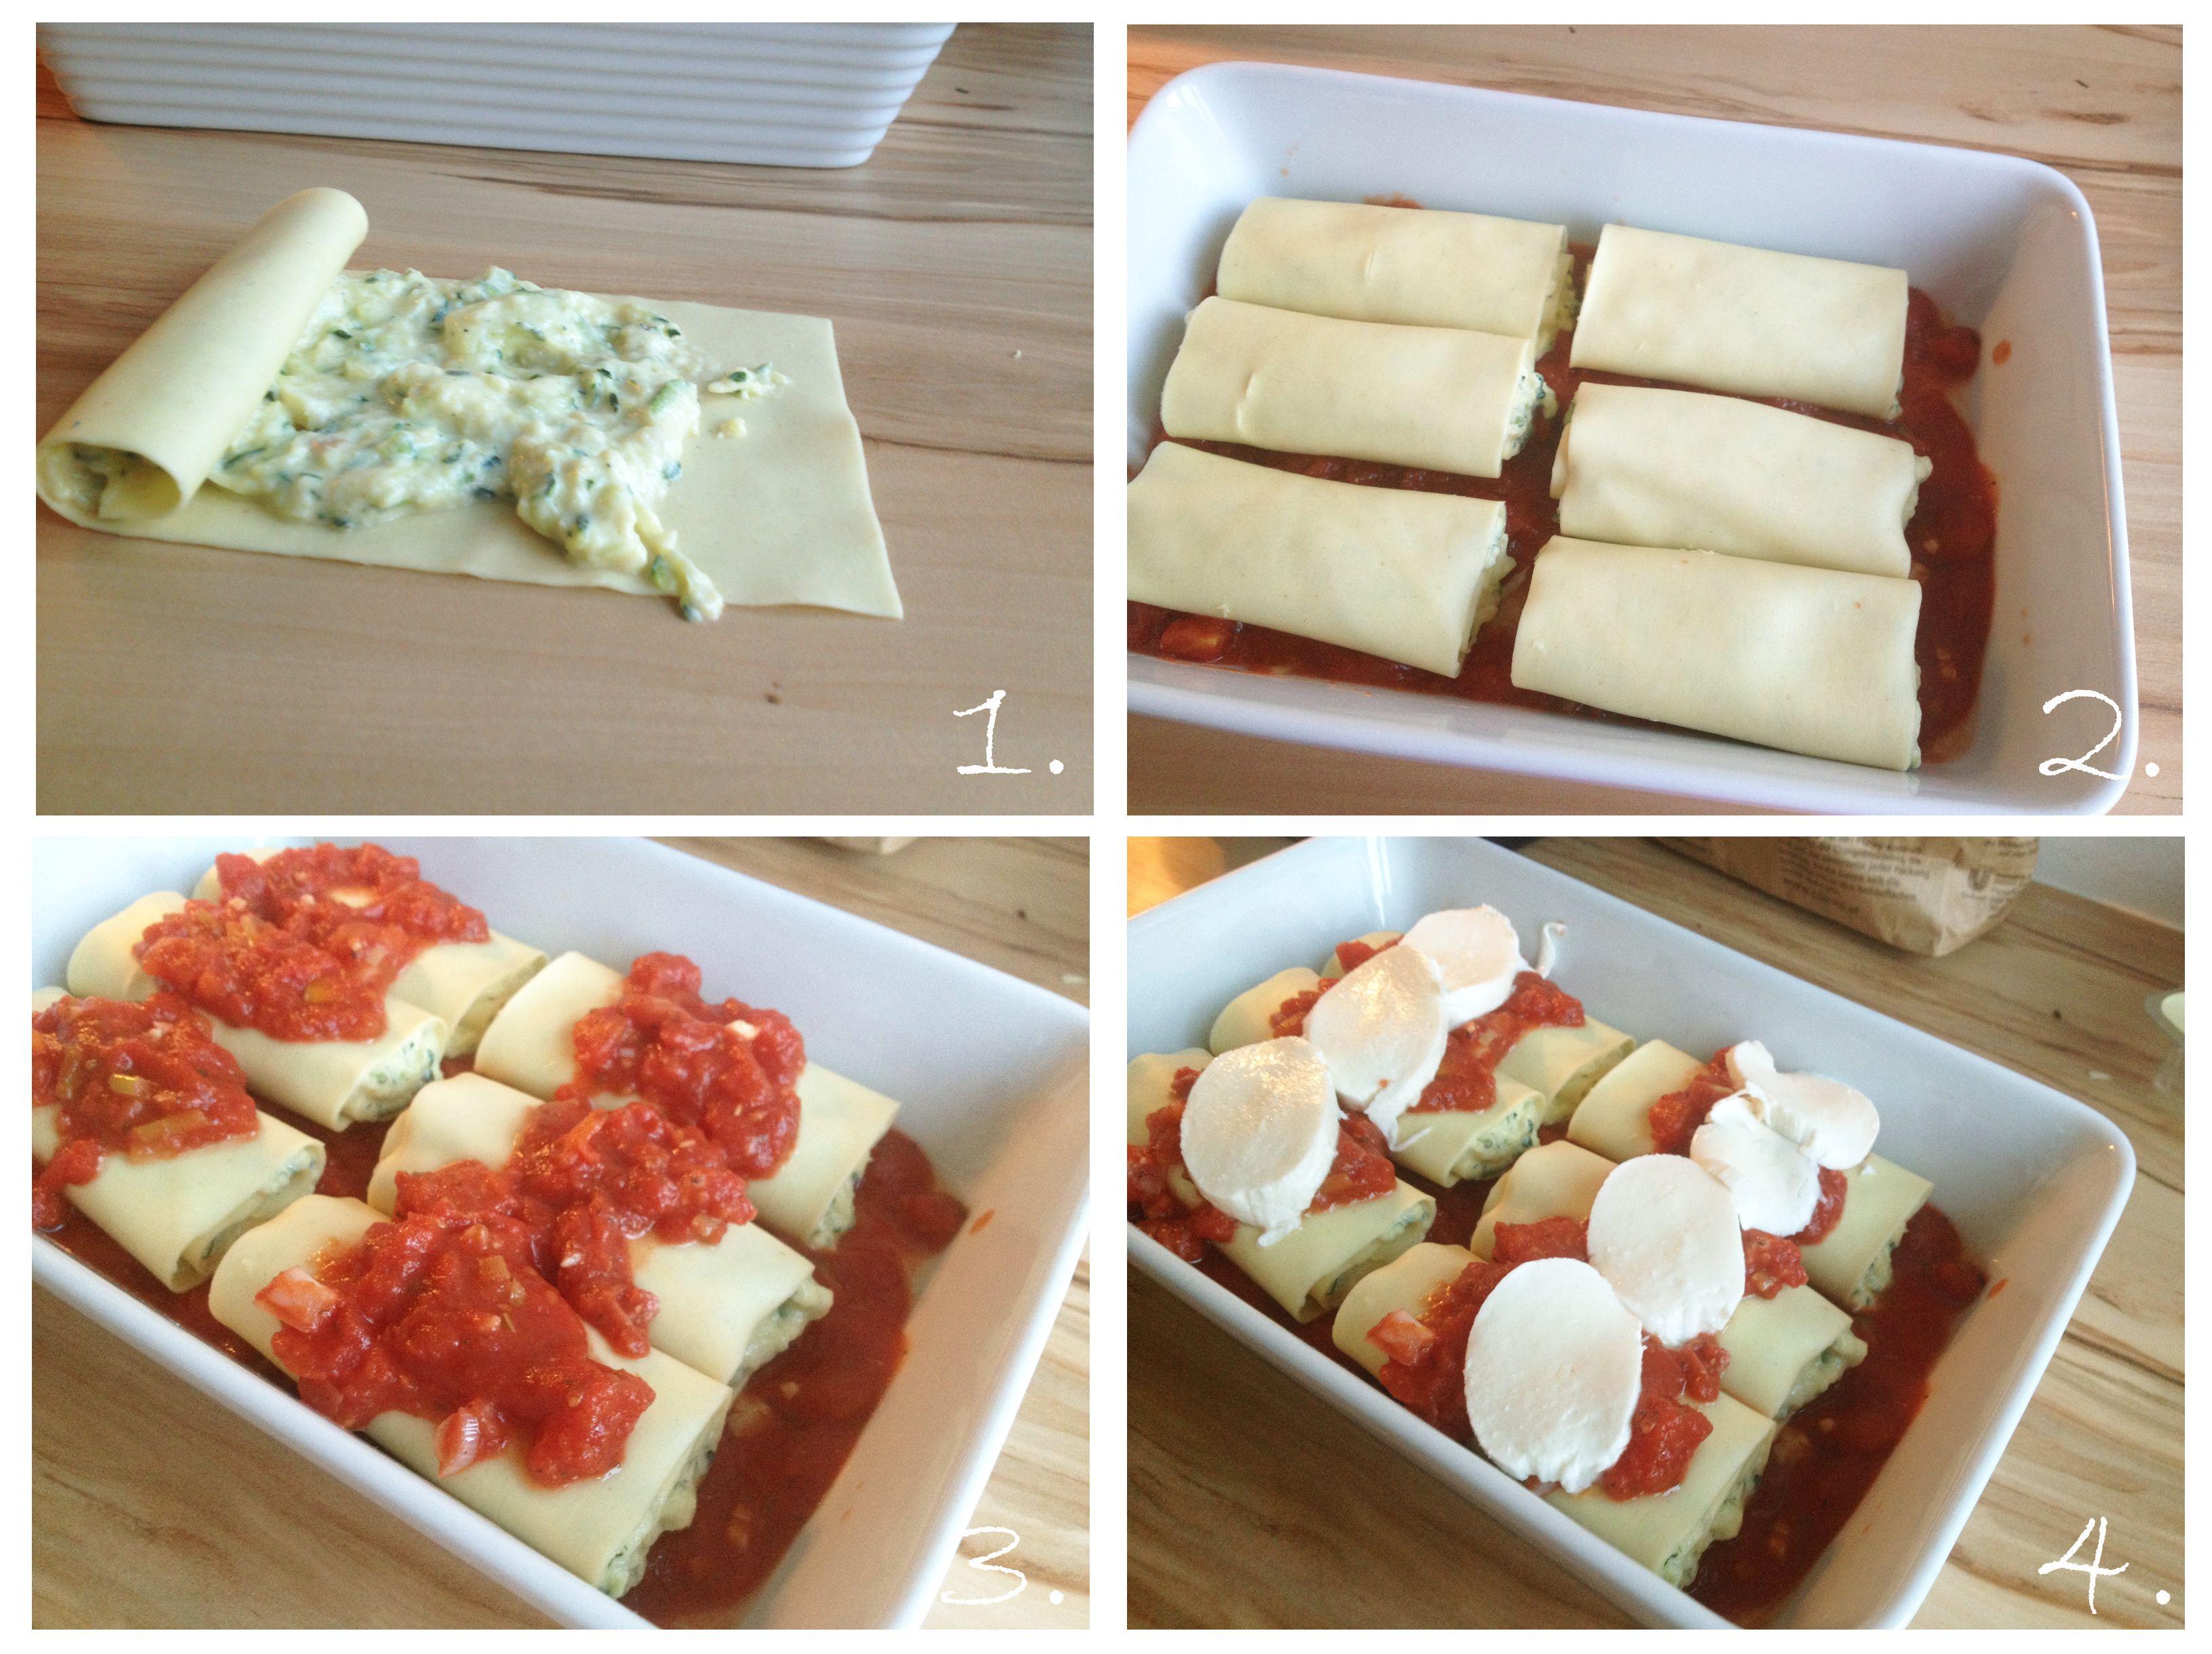 Anleitung Zucchini Lasagne